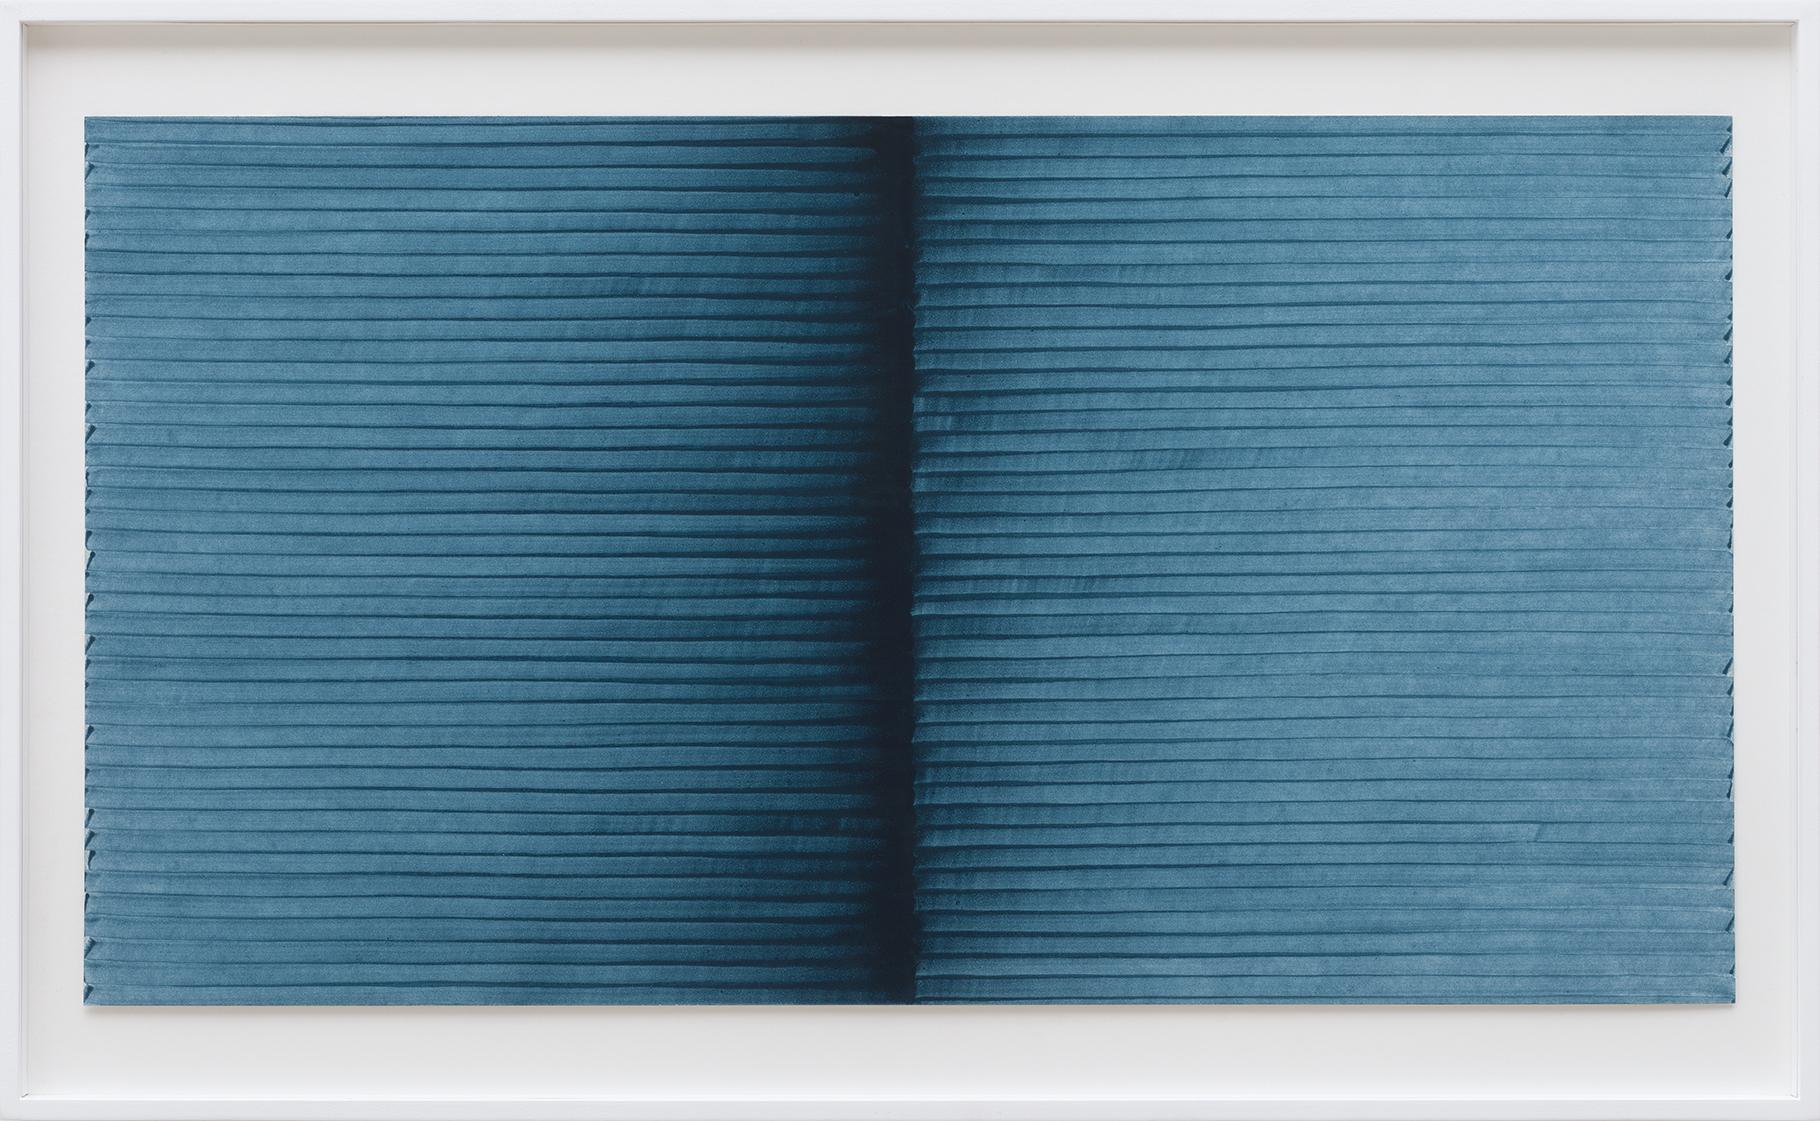 Radical Writings, Exercitium IV, oil on cardboard, 34.5 x 64 cm, 1993